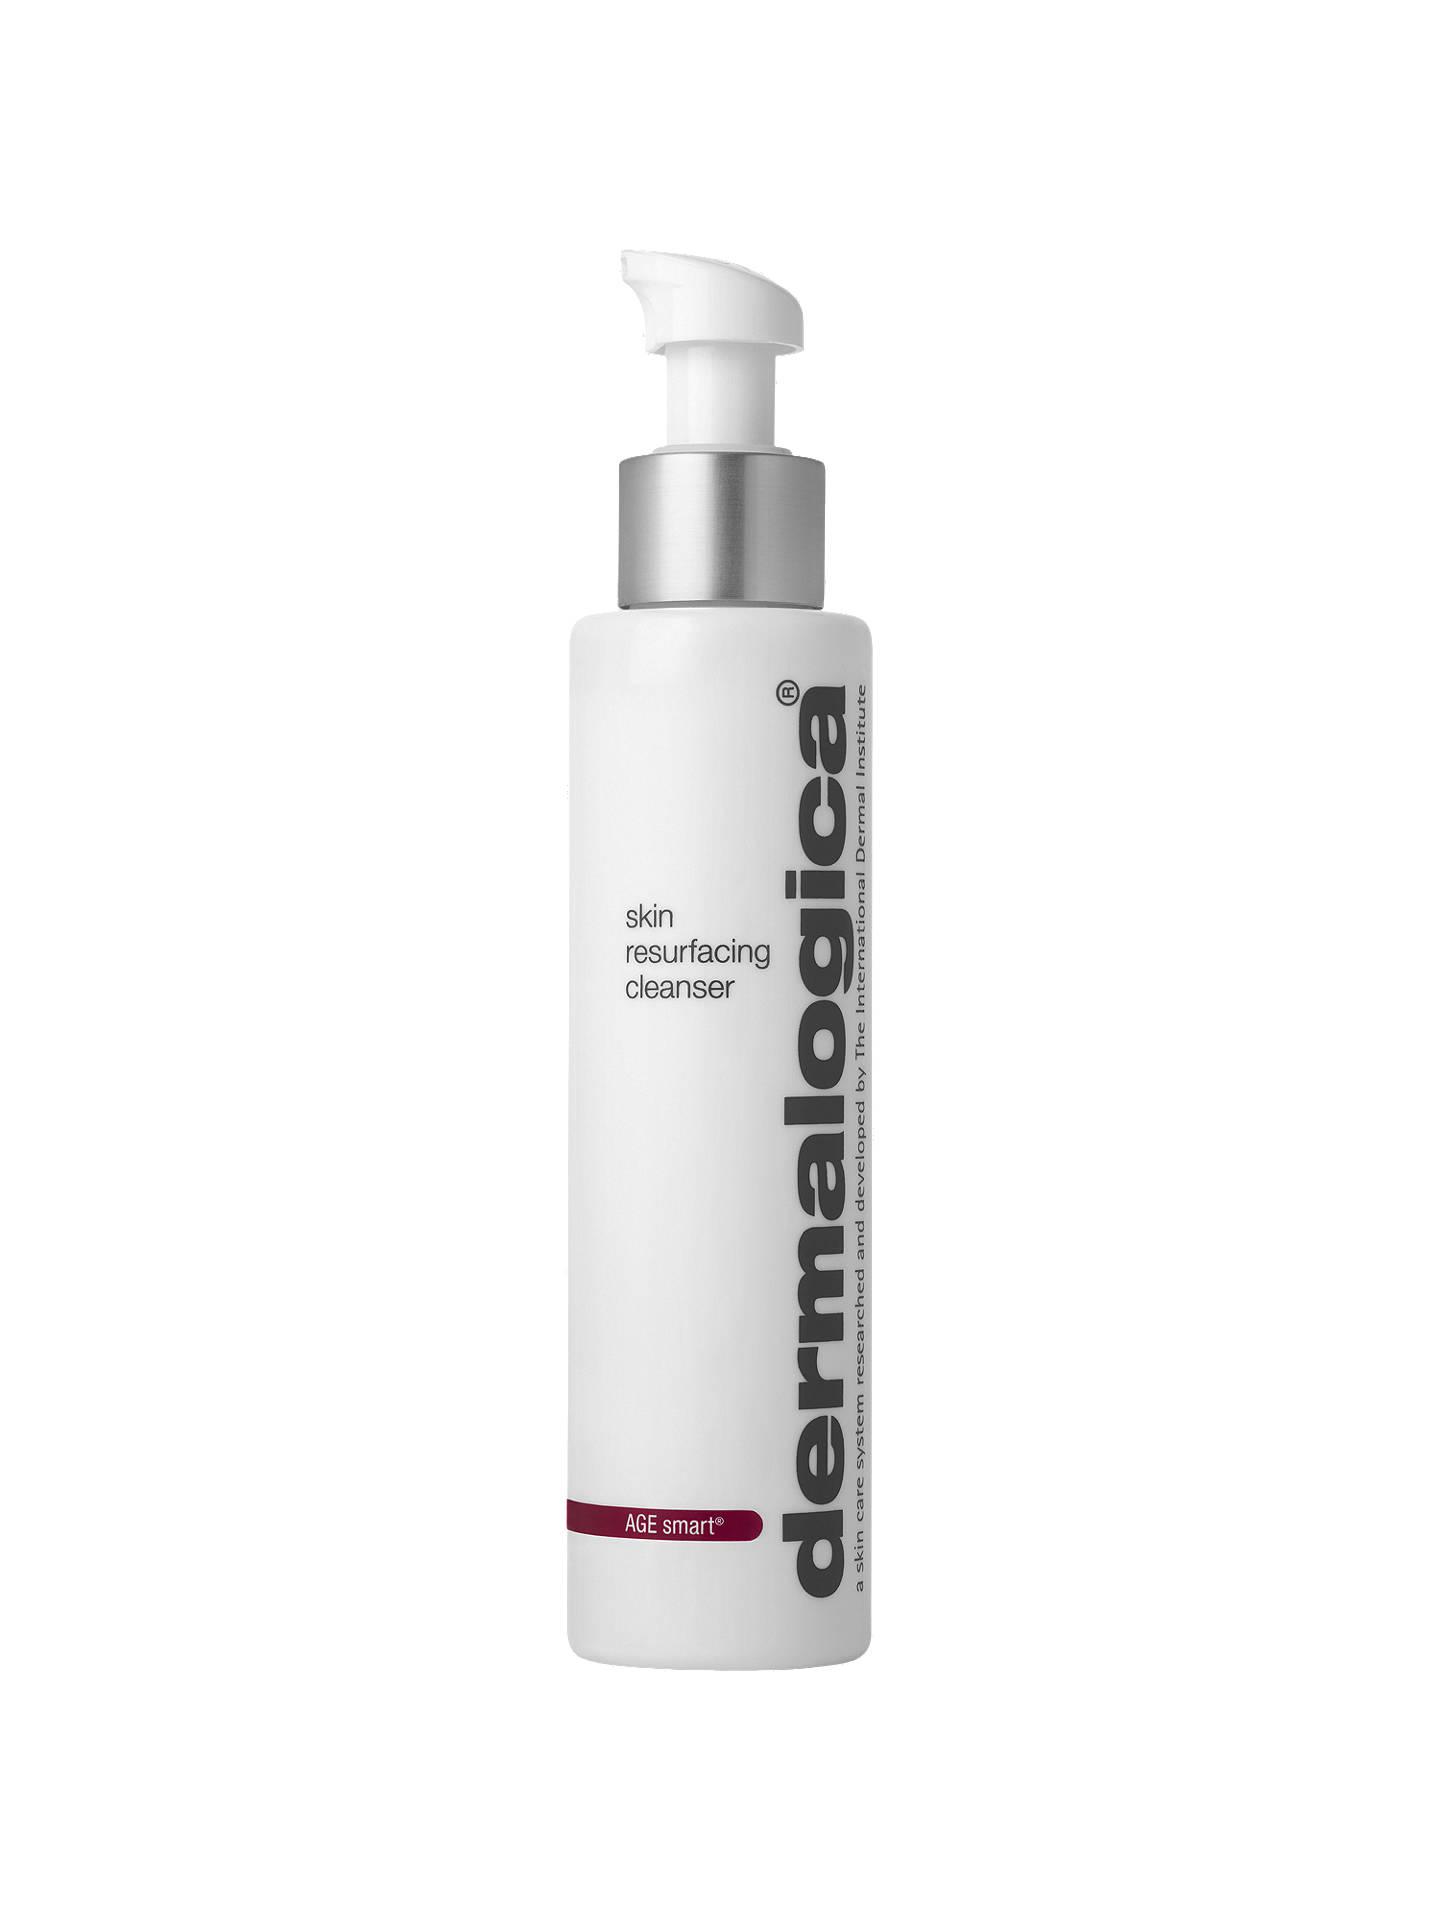 dermalogica - Age Smart Skin Resurfacing Cleanser 150 ml